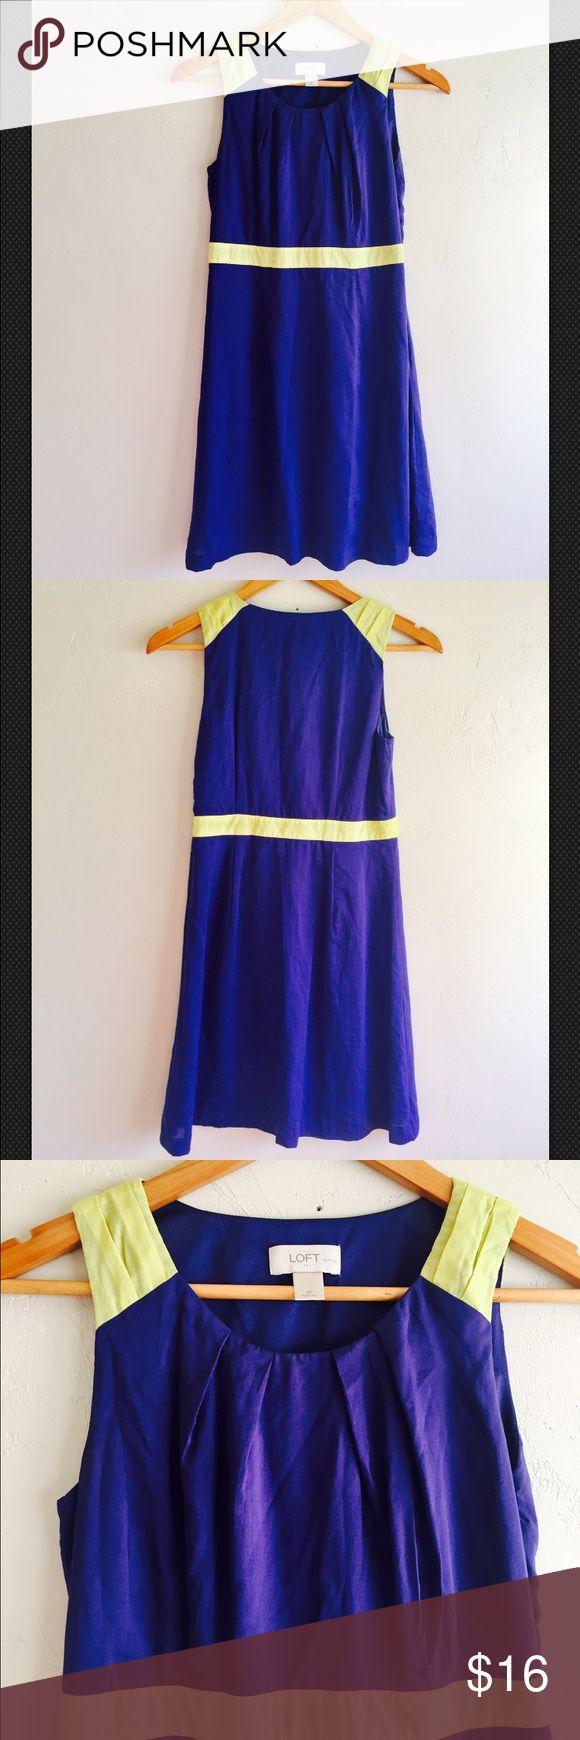 Ann Taylor Loft Petite Navy Blue Yellow Dress Ann Taylor Loft Petites Navy Blue Yellow Sleeveless Sheath Dress  Petite 0 P Moral/polyester Preowned LOFT Dresses